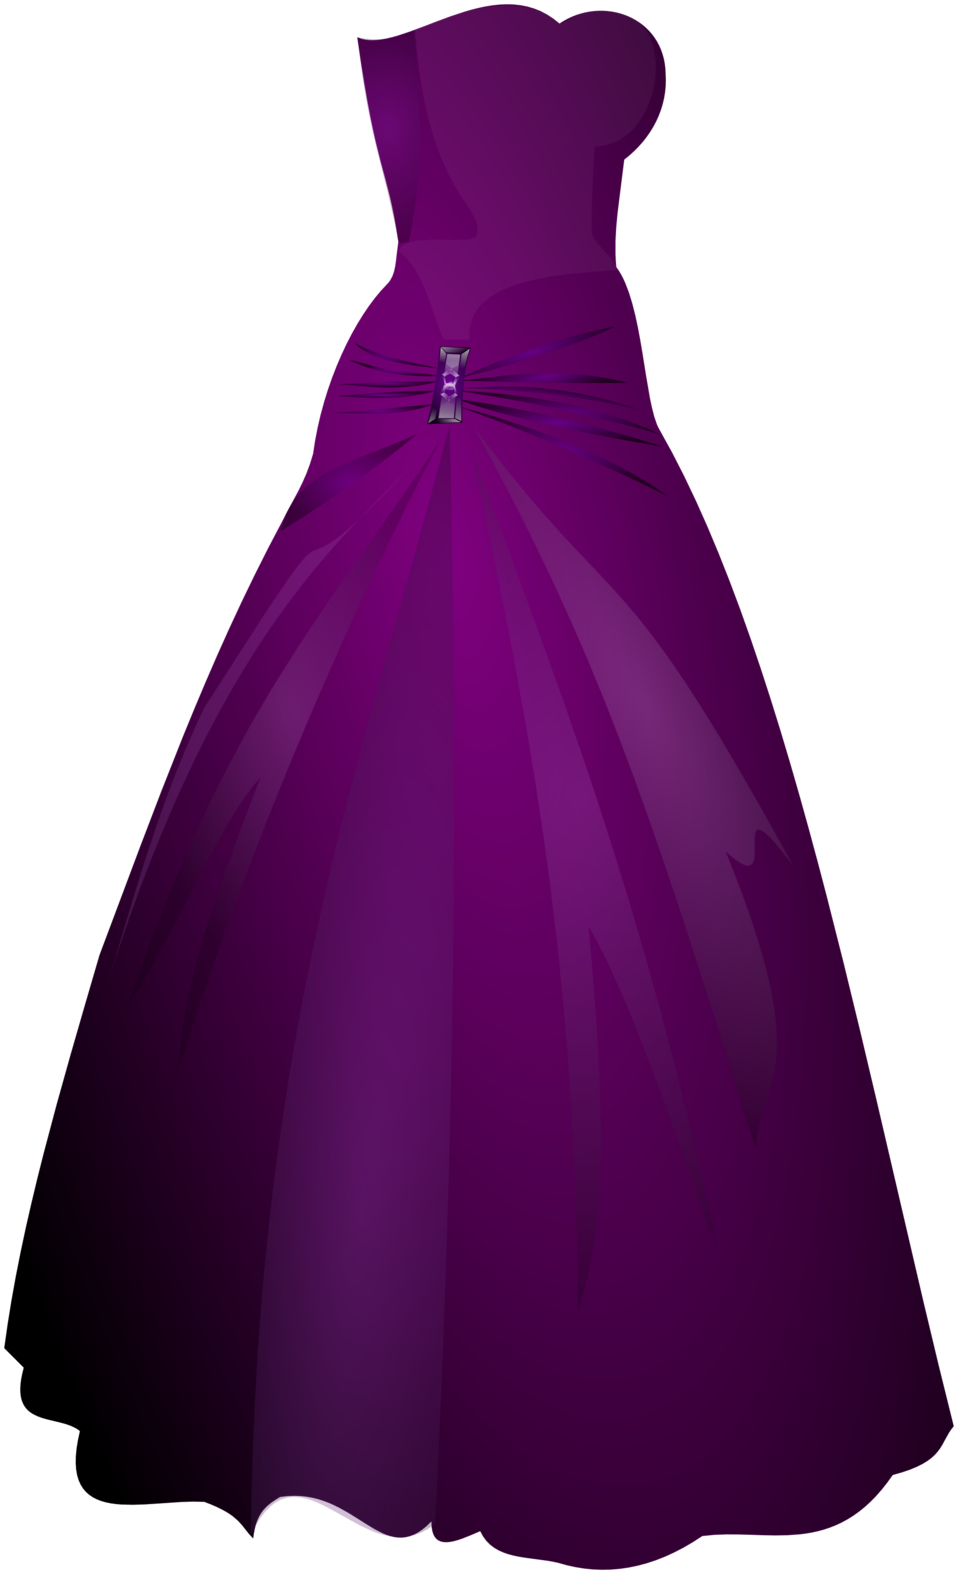 Public domain clip art. Dress clipart strapless dress